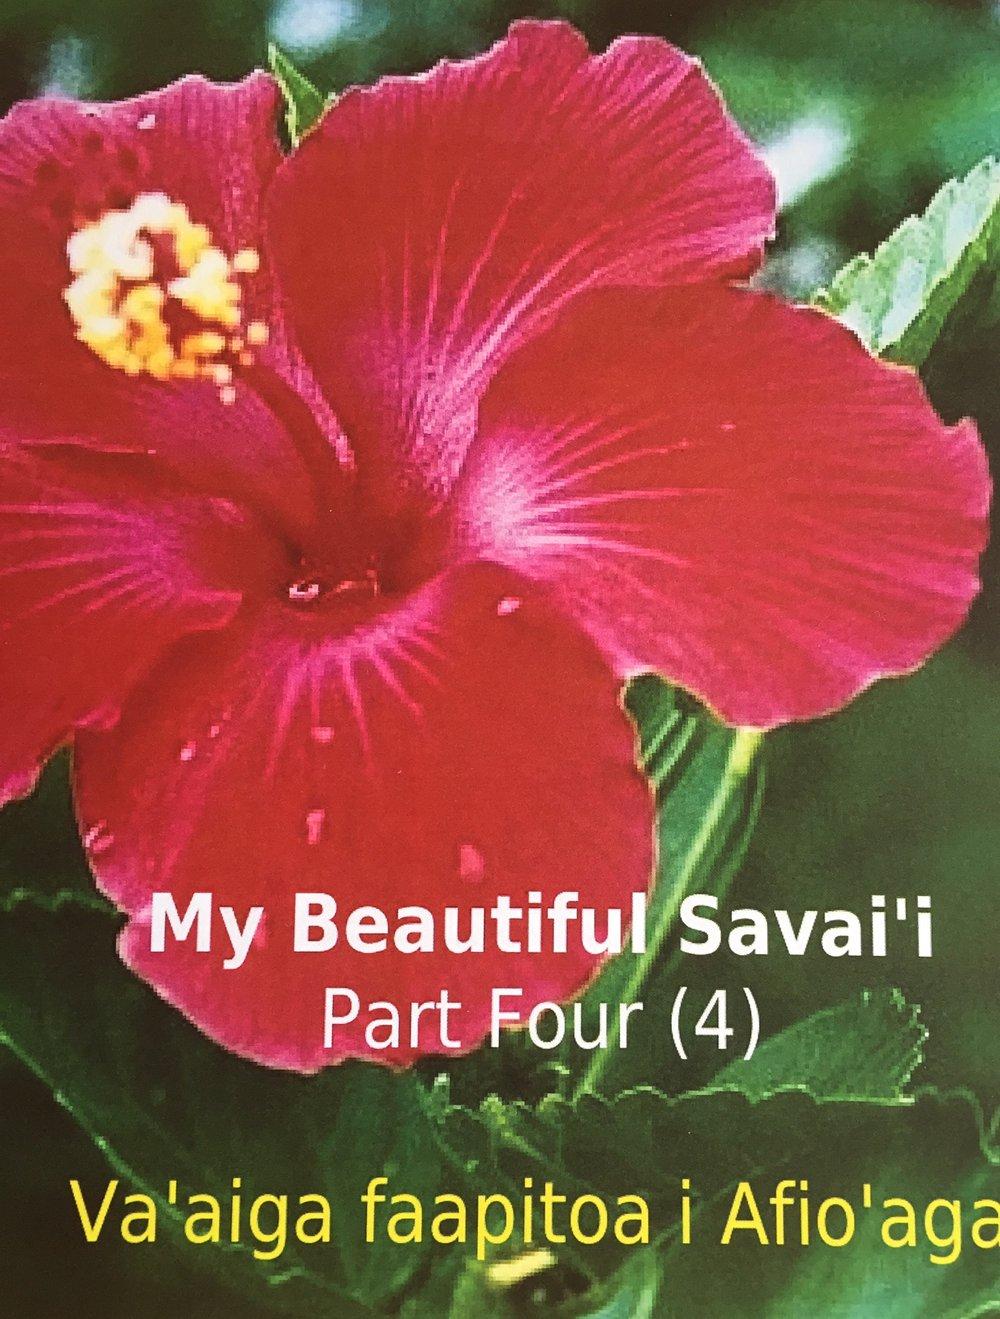 Image of My Beautiful Savaii 4